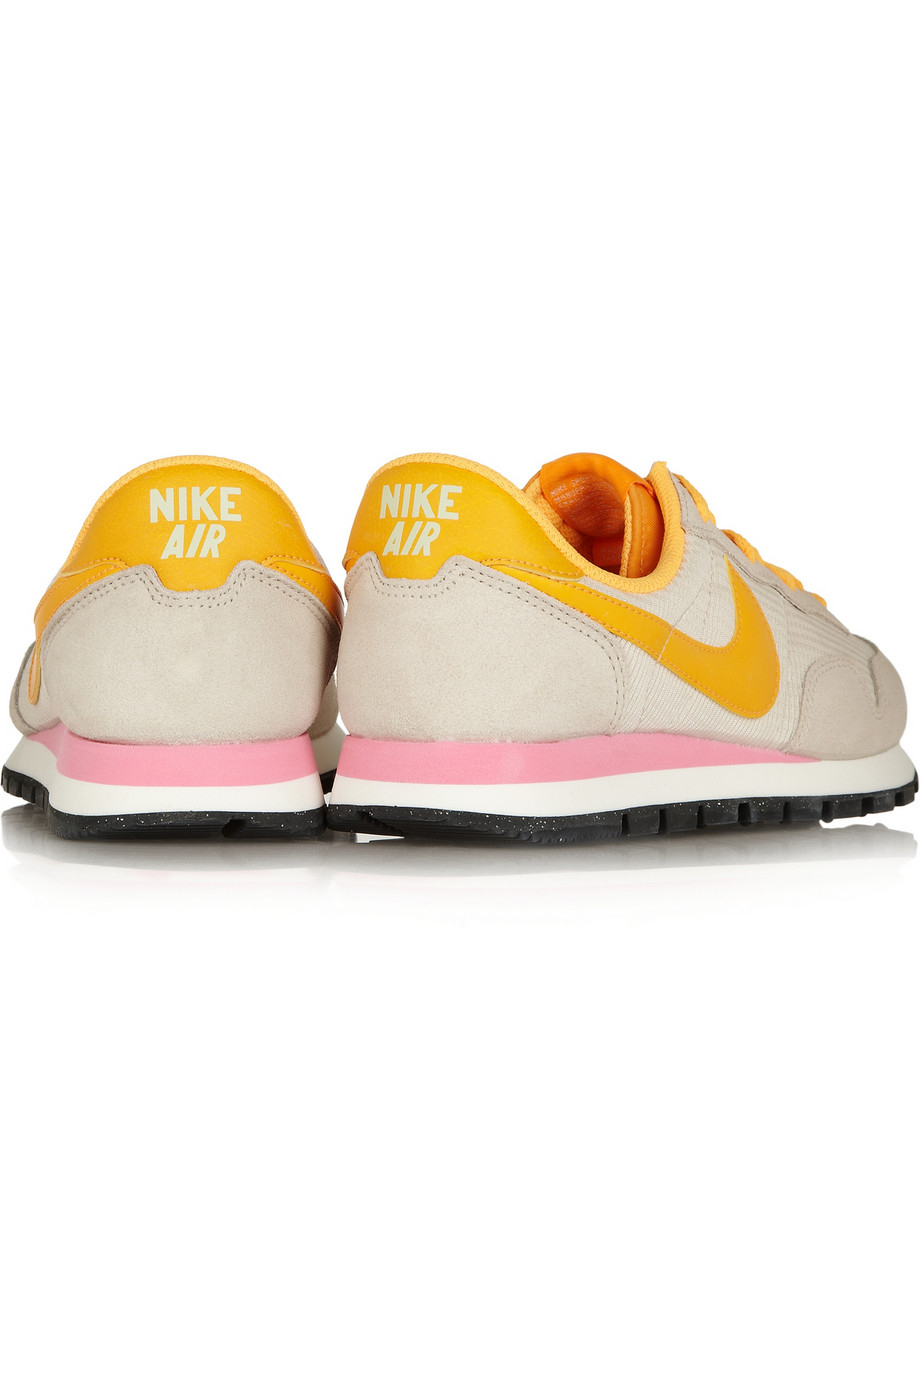 Nike Air Pegasus 83 Leather, Suede And Mesh Sneakers in Orange